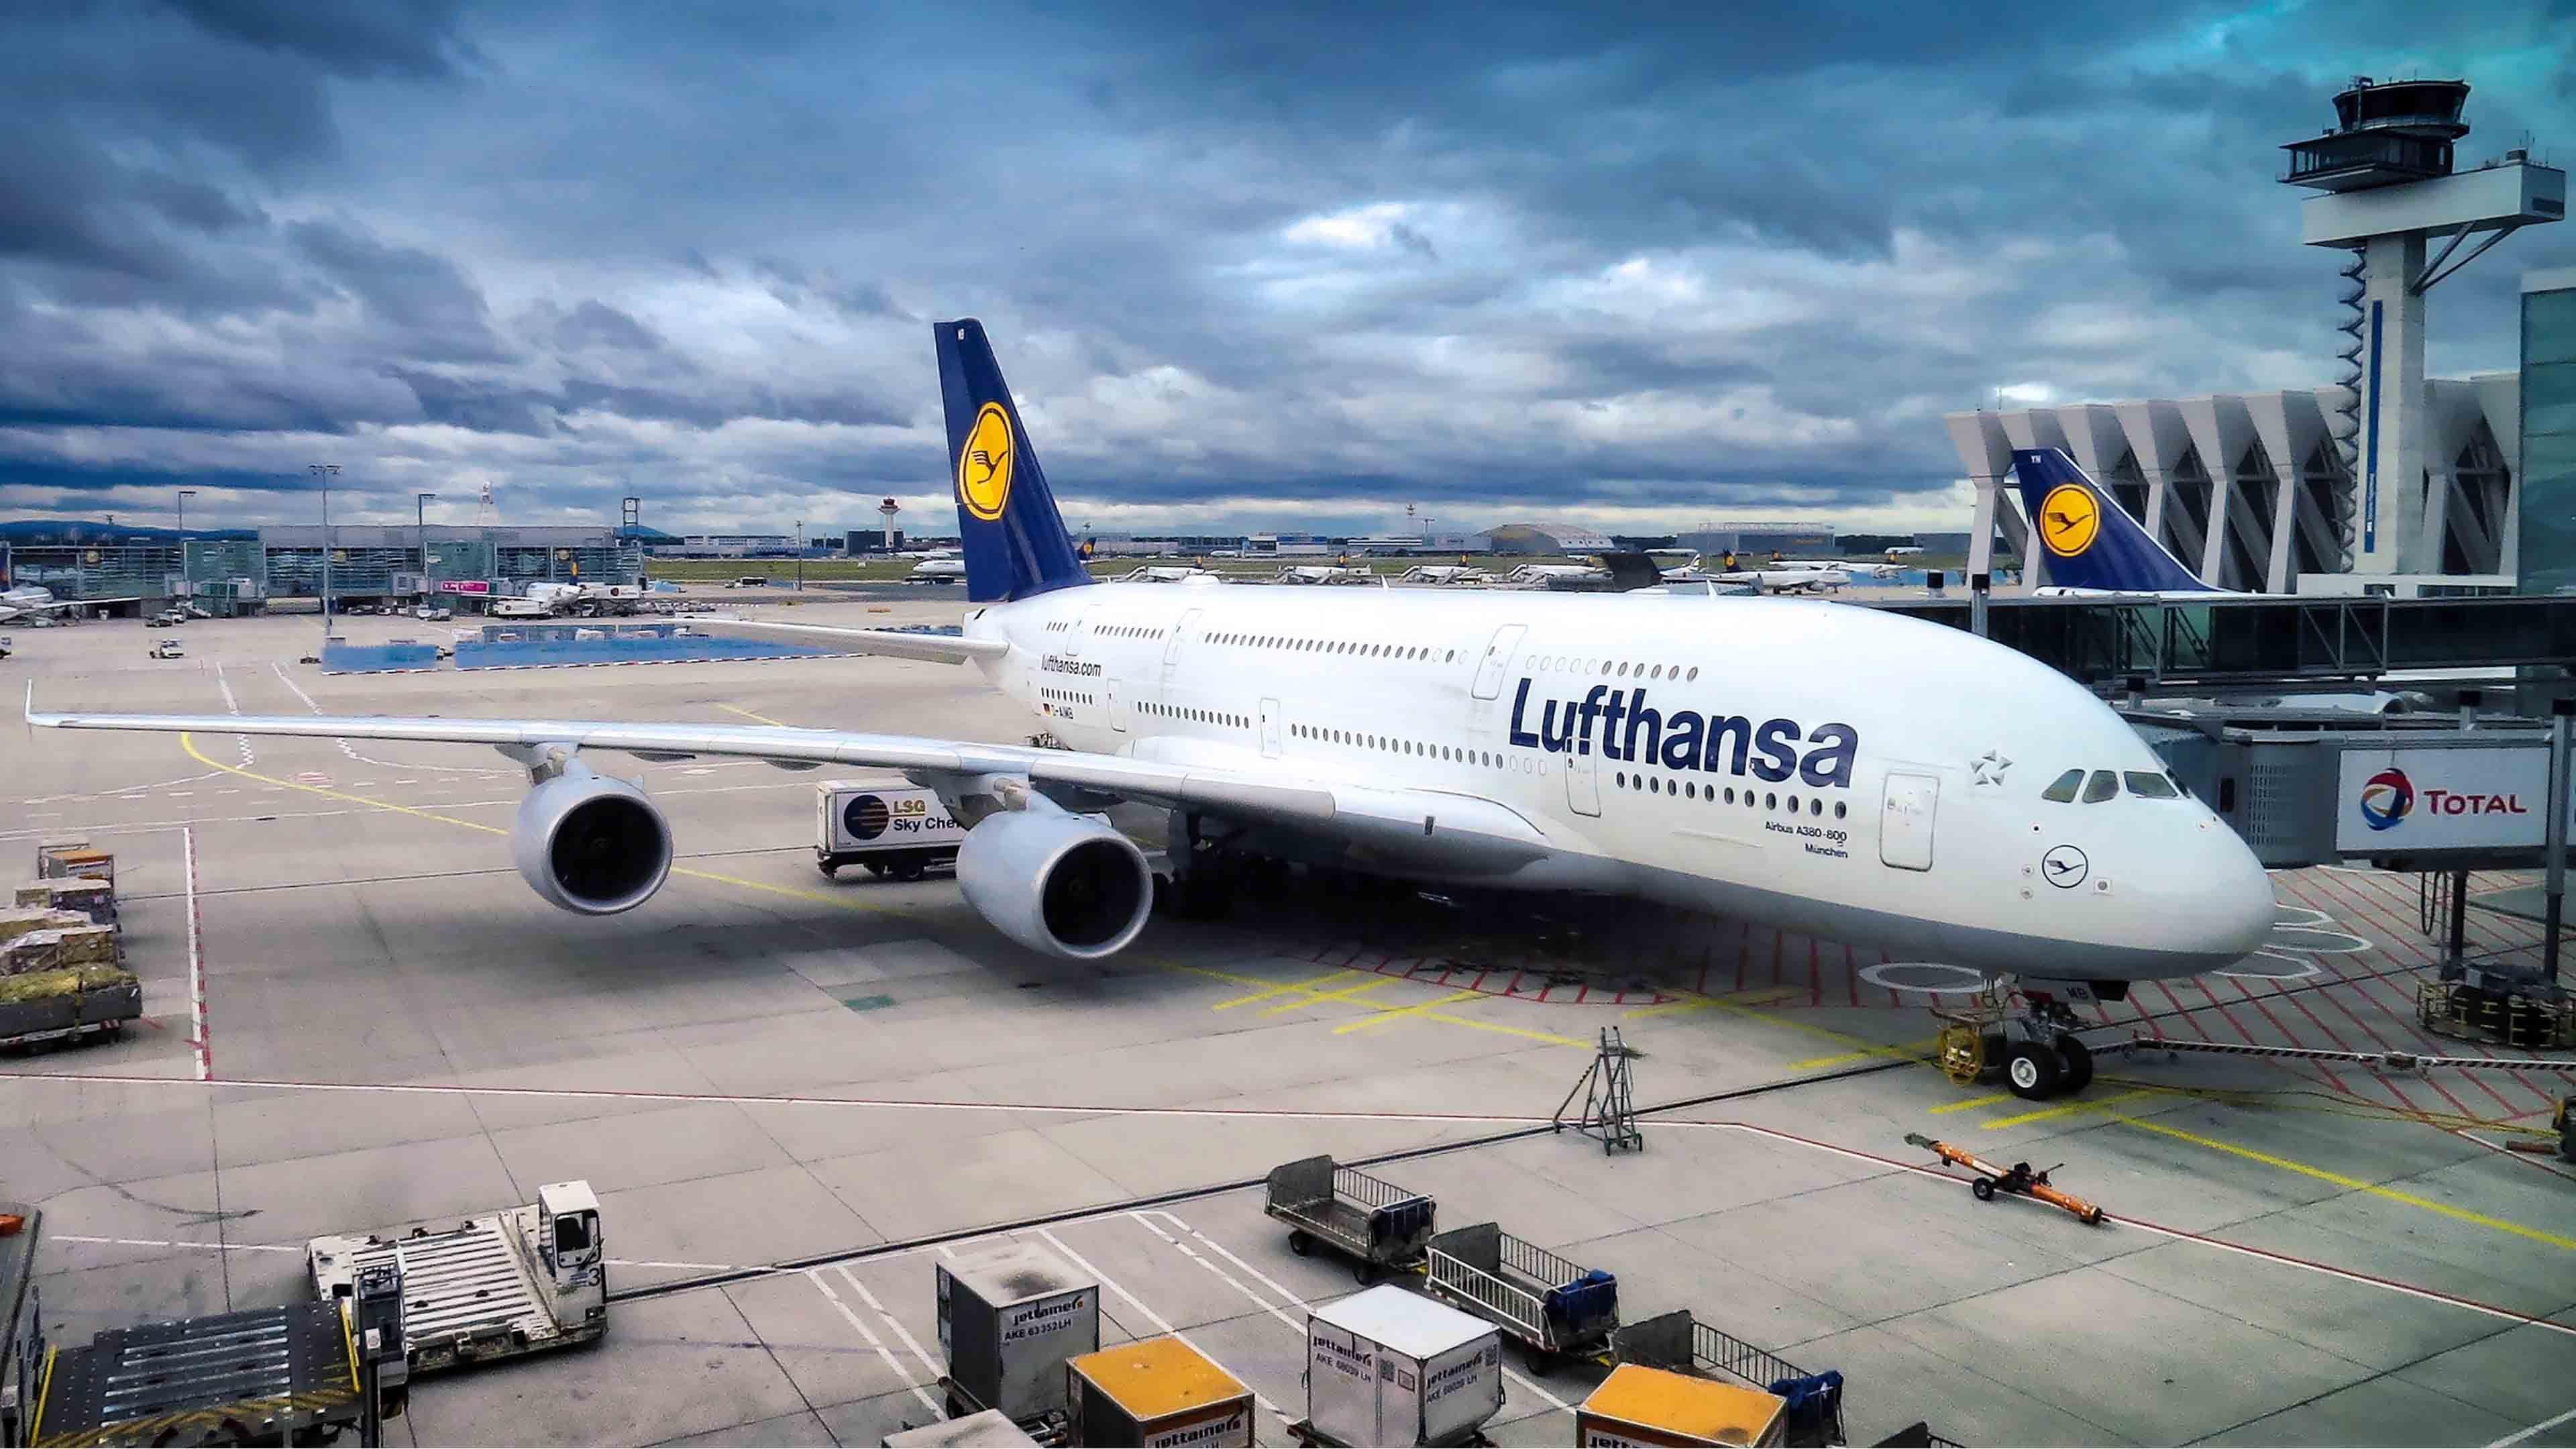 A380 Aircraft Airline A380 Aircraft Airline A380 Aircraft